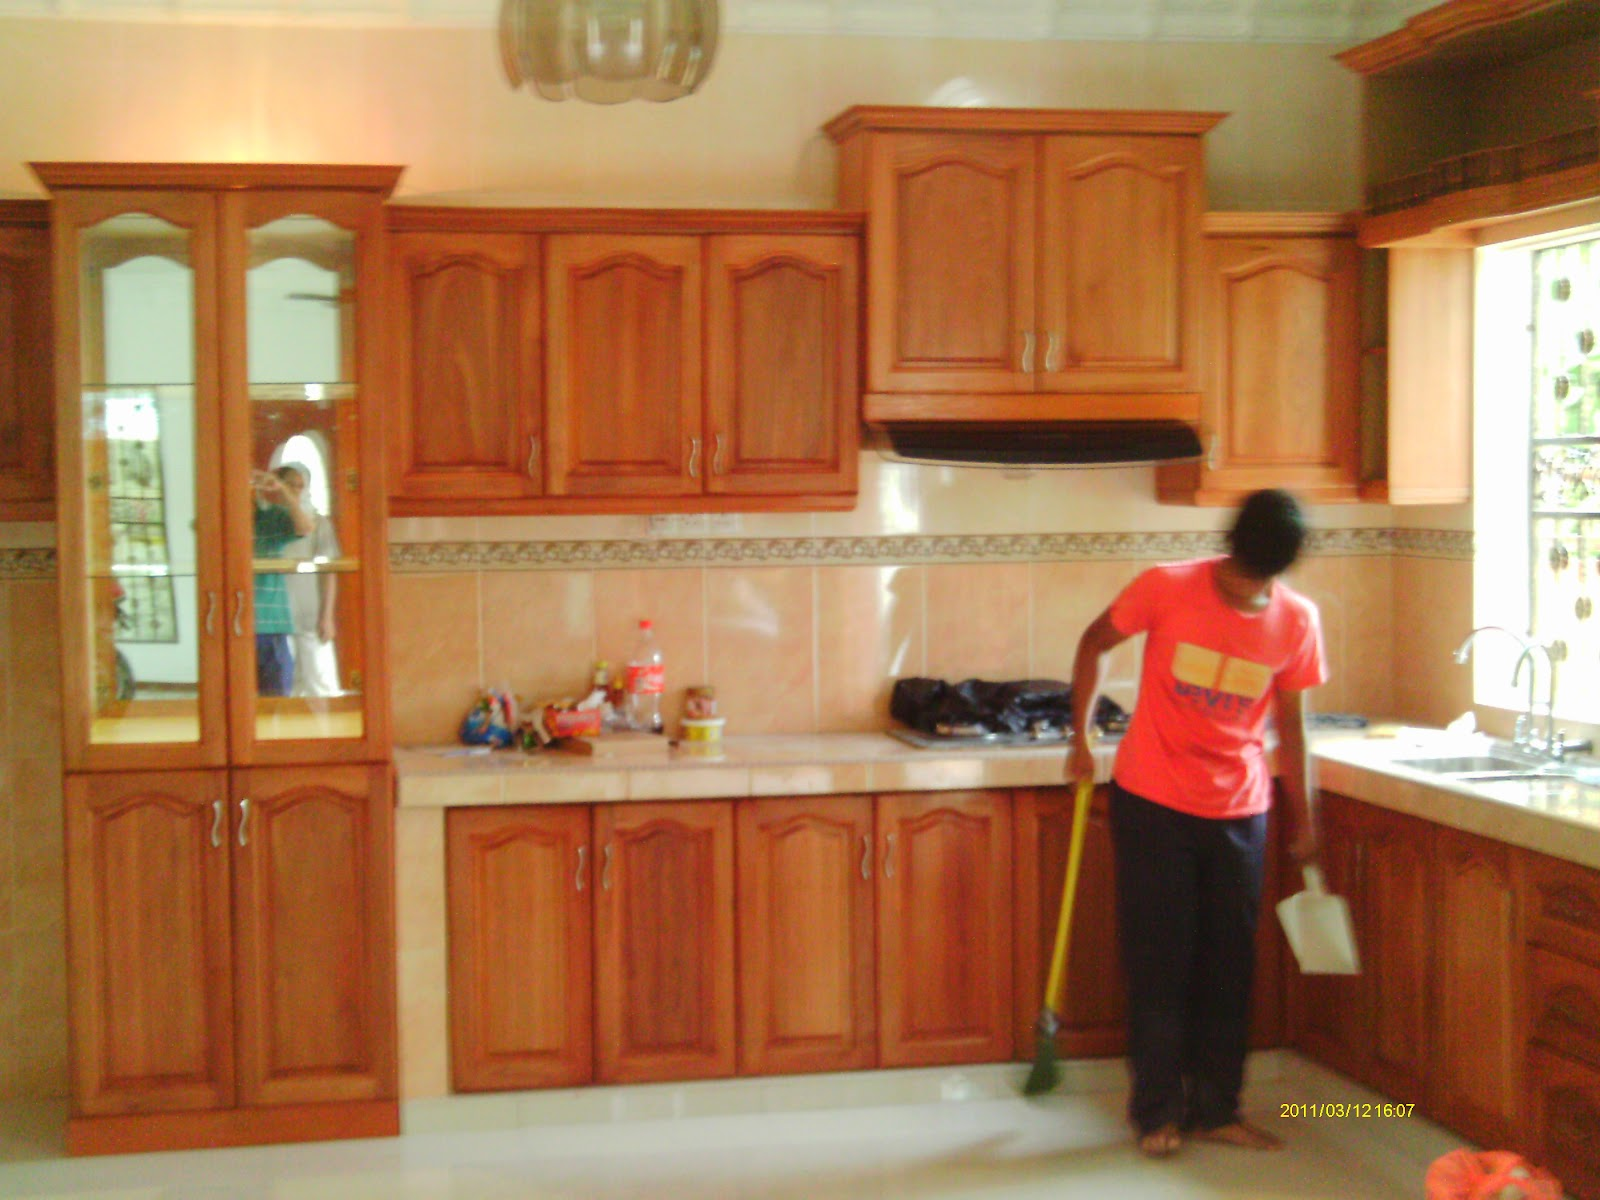 Pakar Ubahsuai Rumah Gambar Gambar Kitchen Kabinet 2012